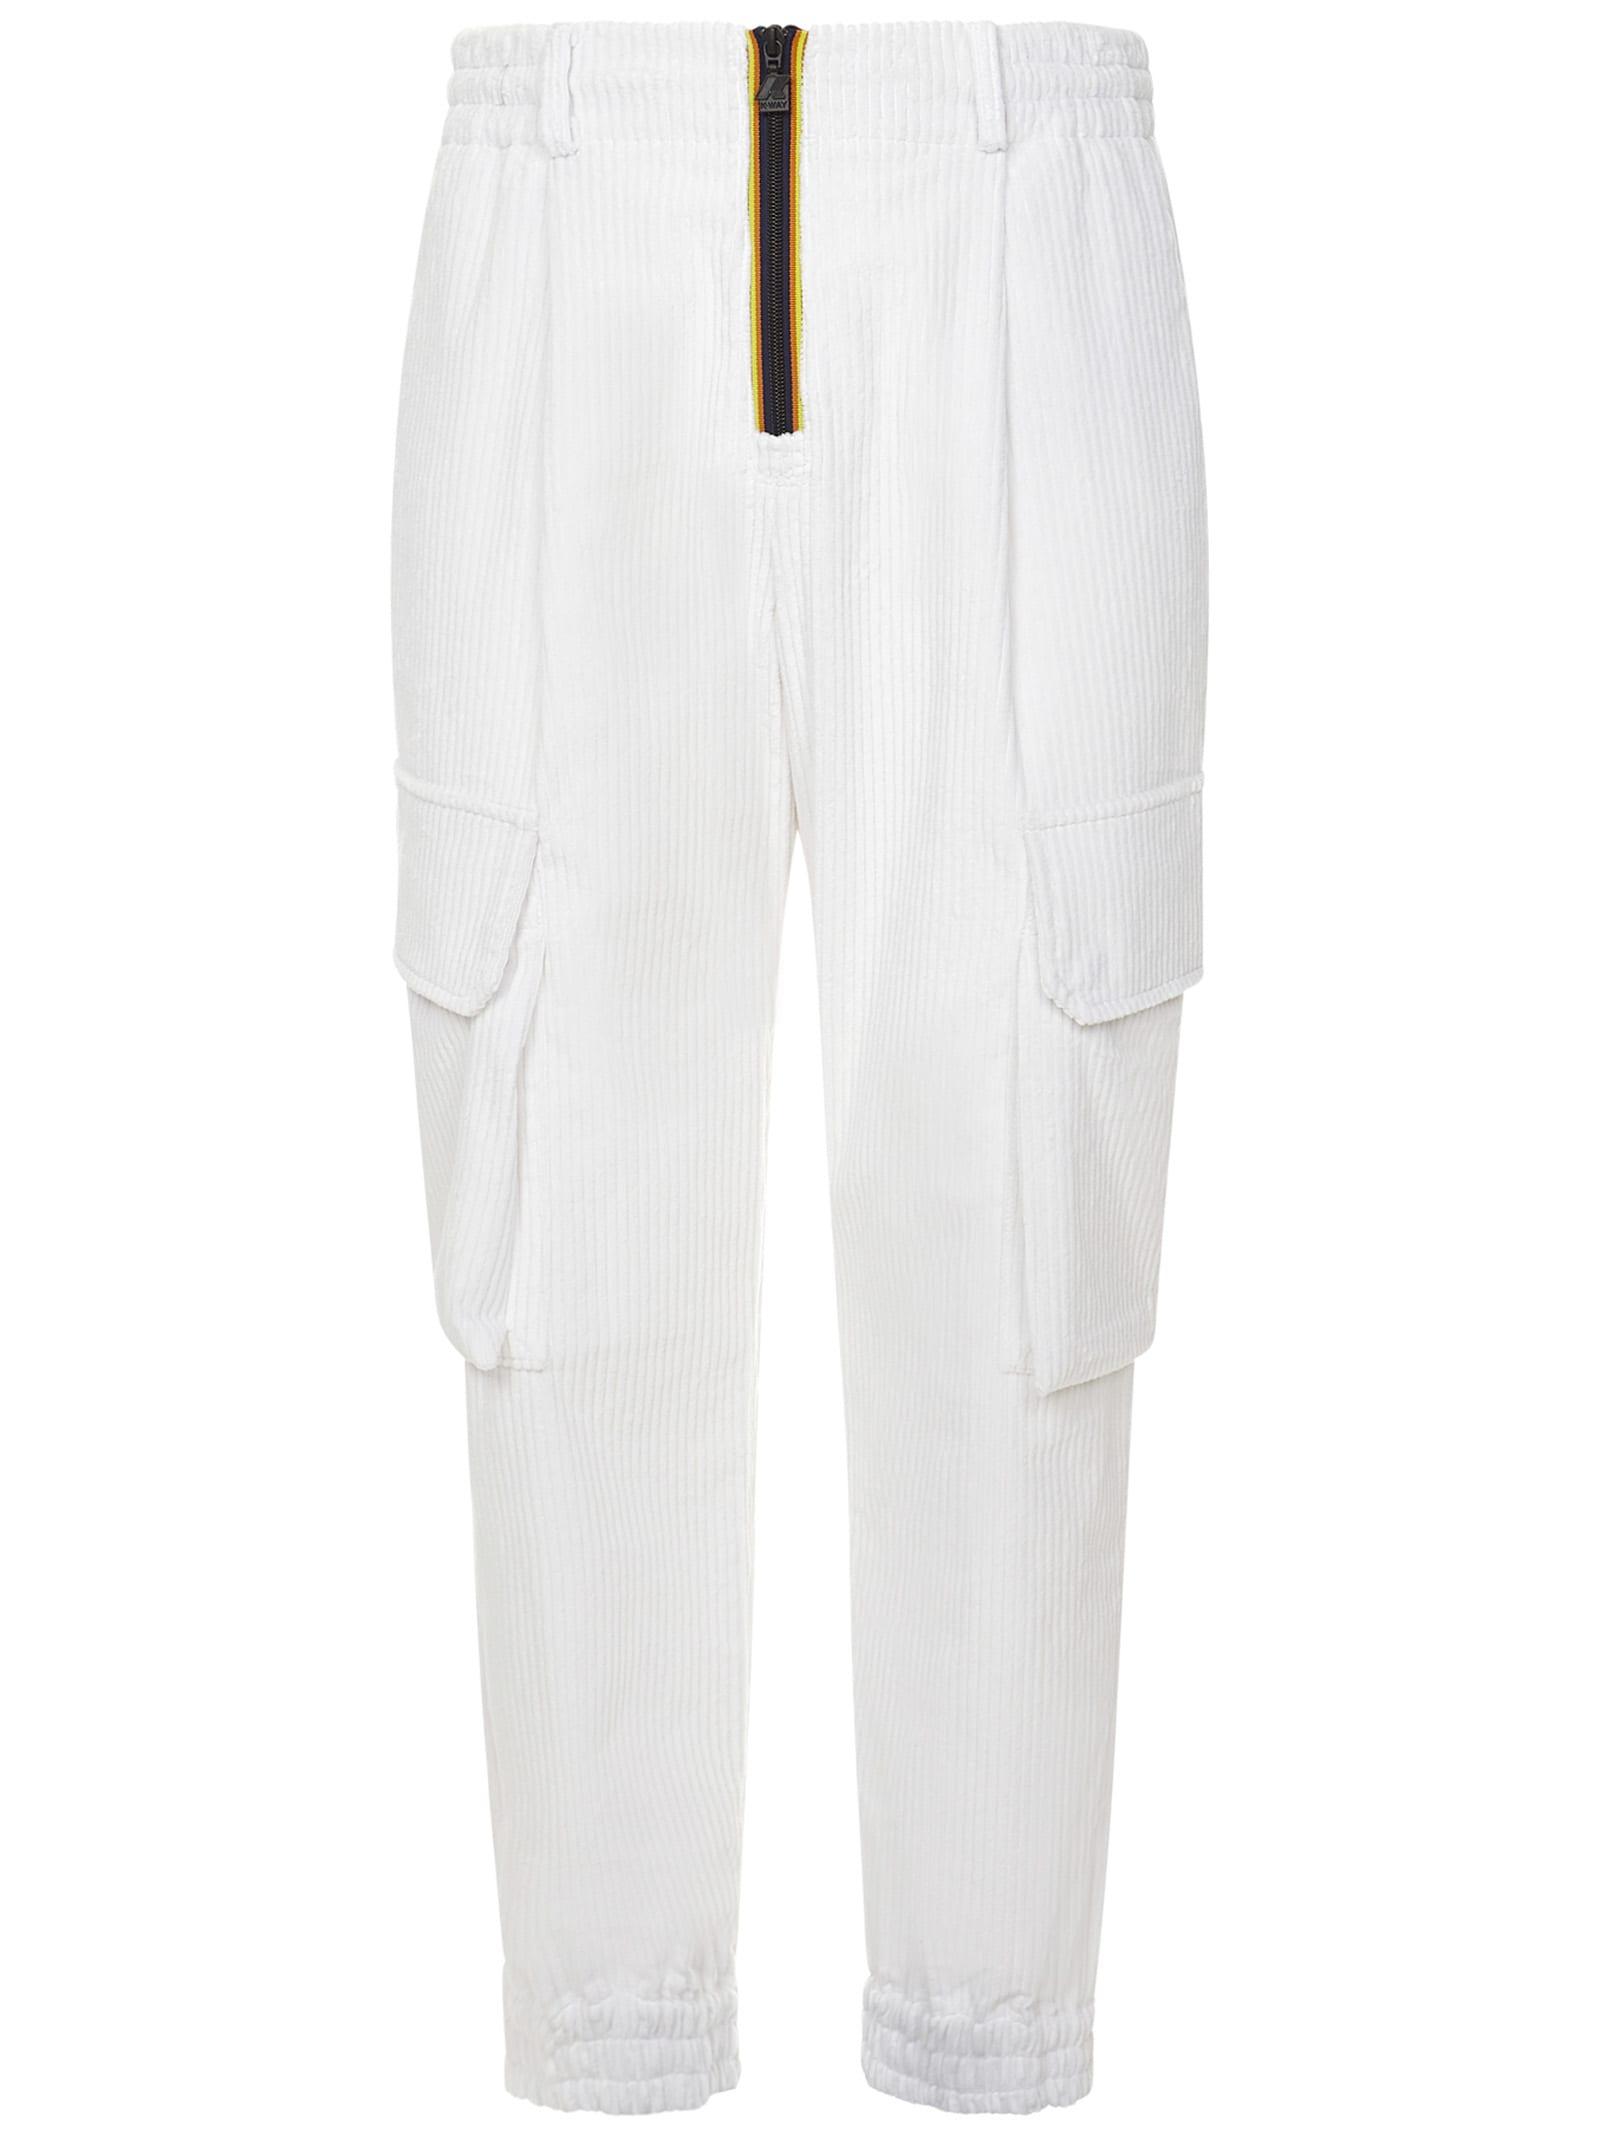 Leo Pocket Trousers